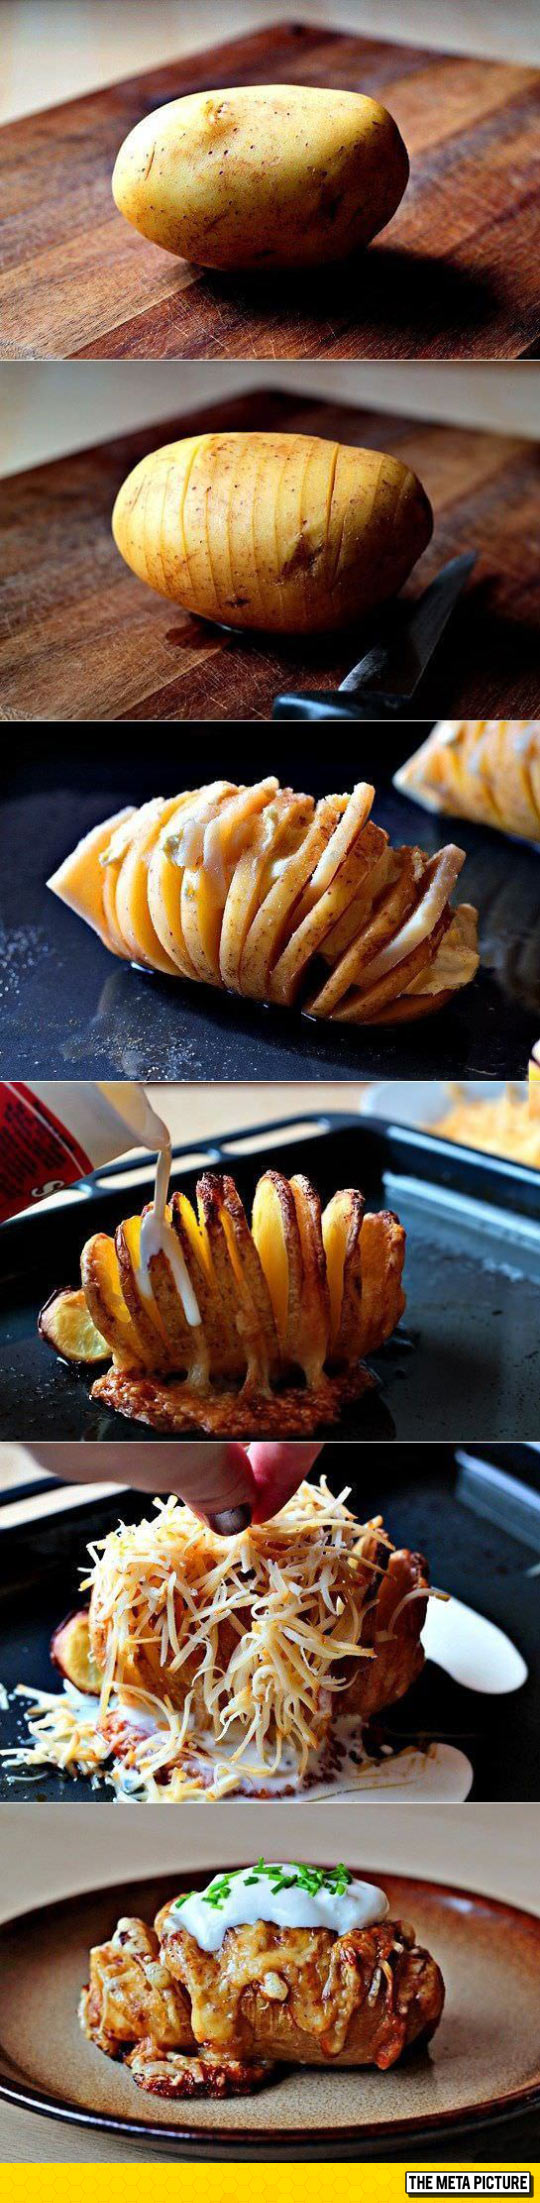 funny-potato-cheese-cream-baked